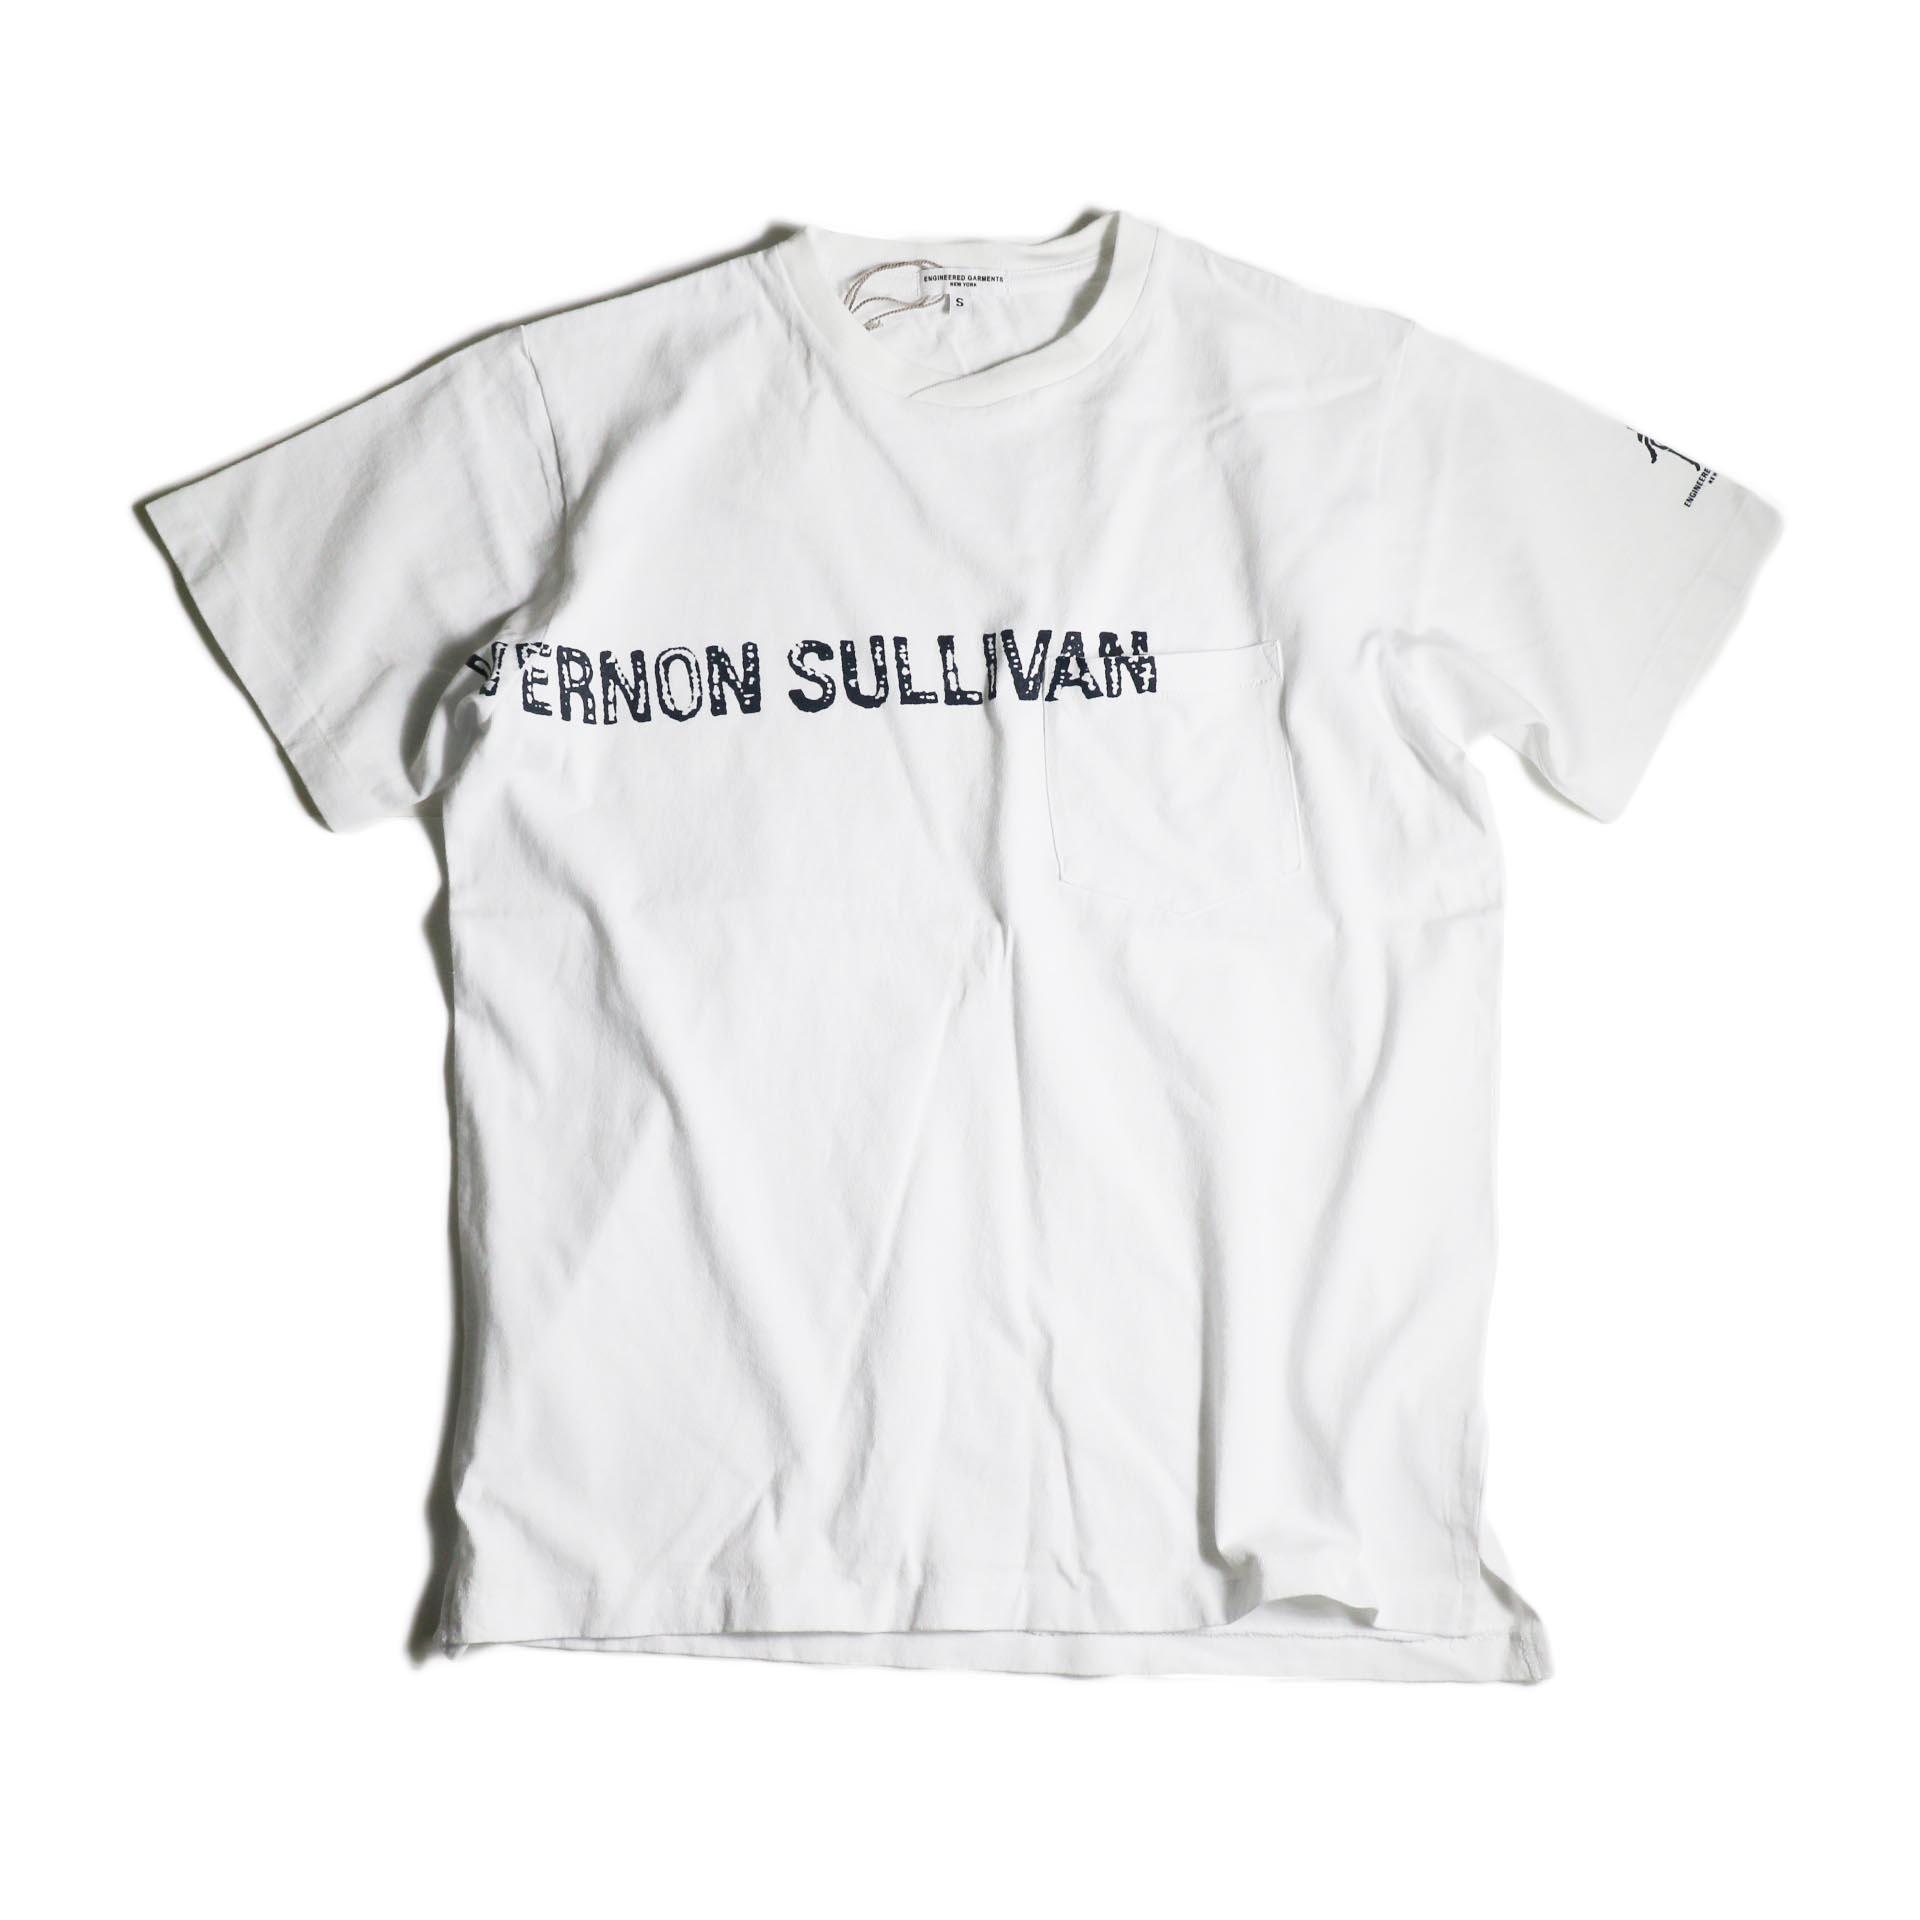 Engineered Garments / Printed Cross Crew Neck T-shirt -Vernon (White)正面